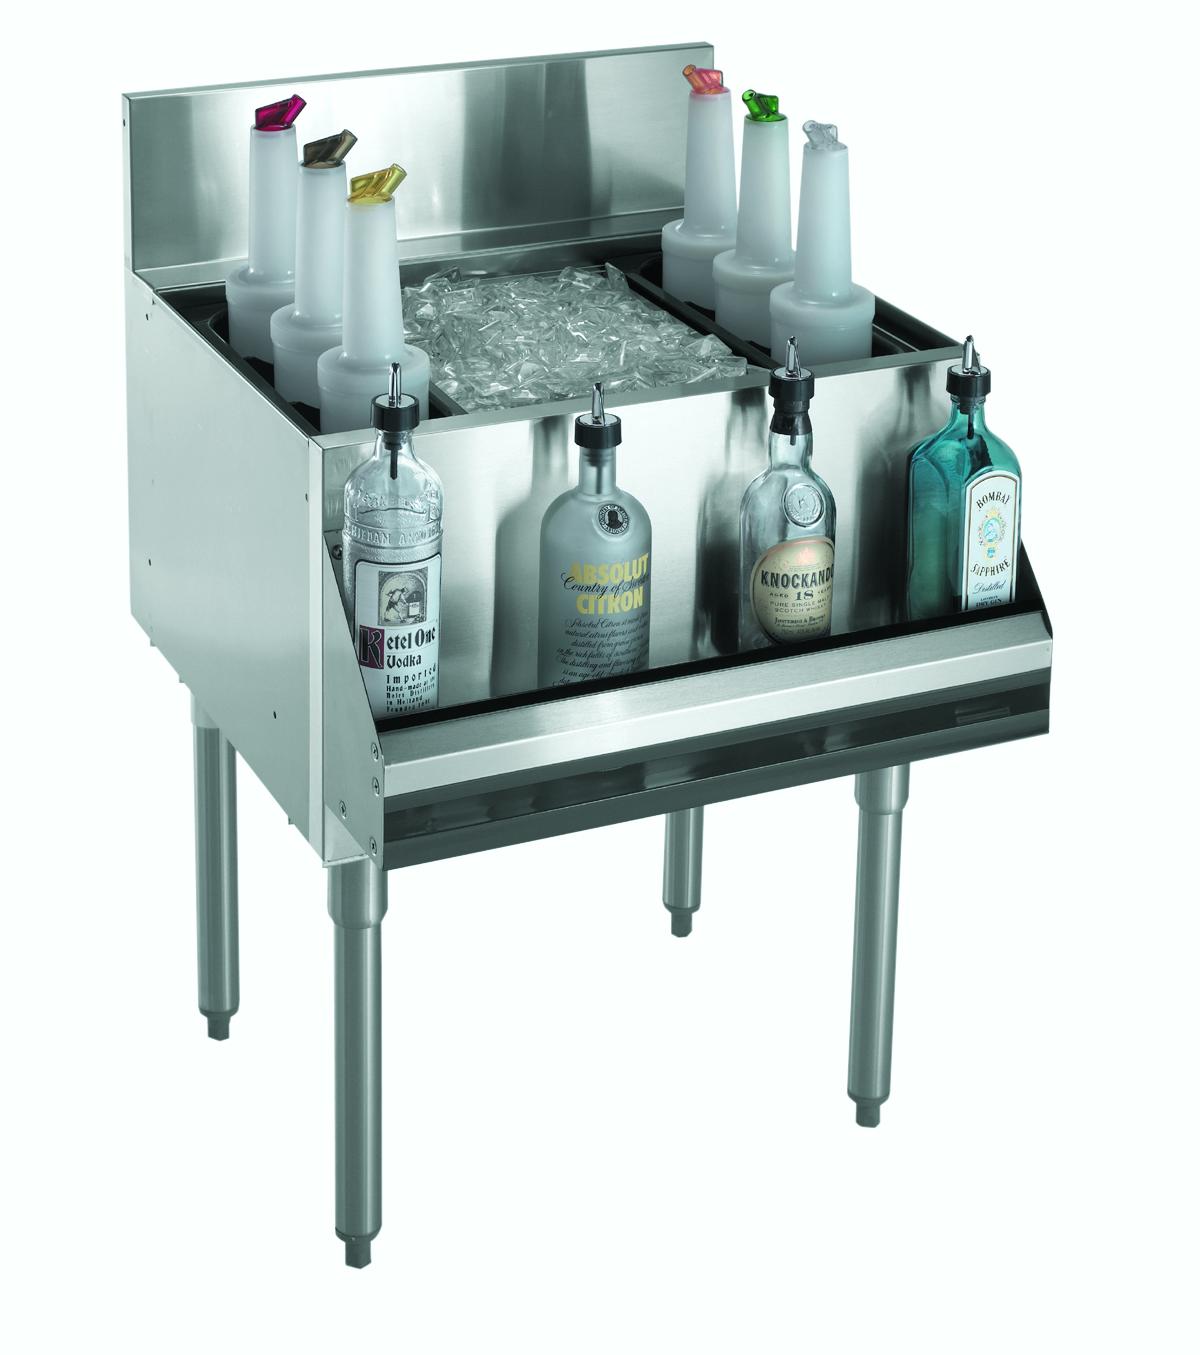 Krowne Metal KR21-24DP underbar ice bin/cocktail unit